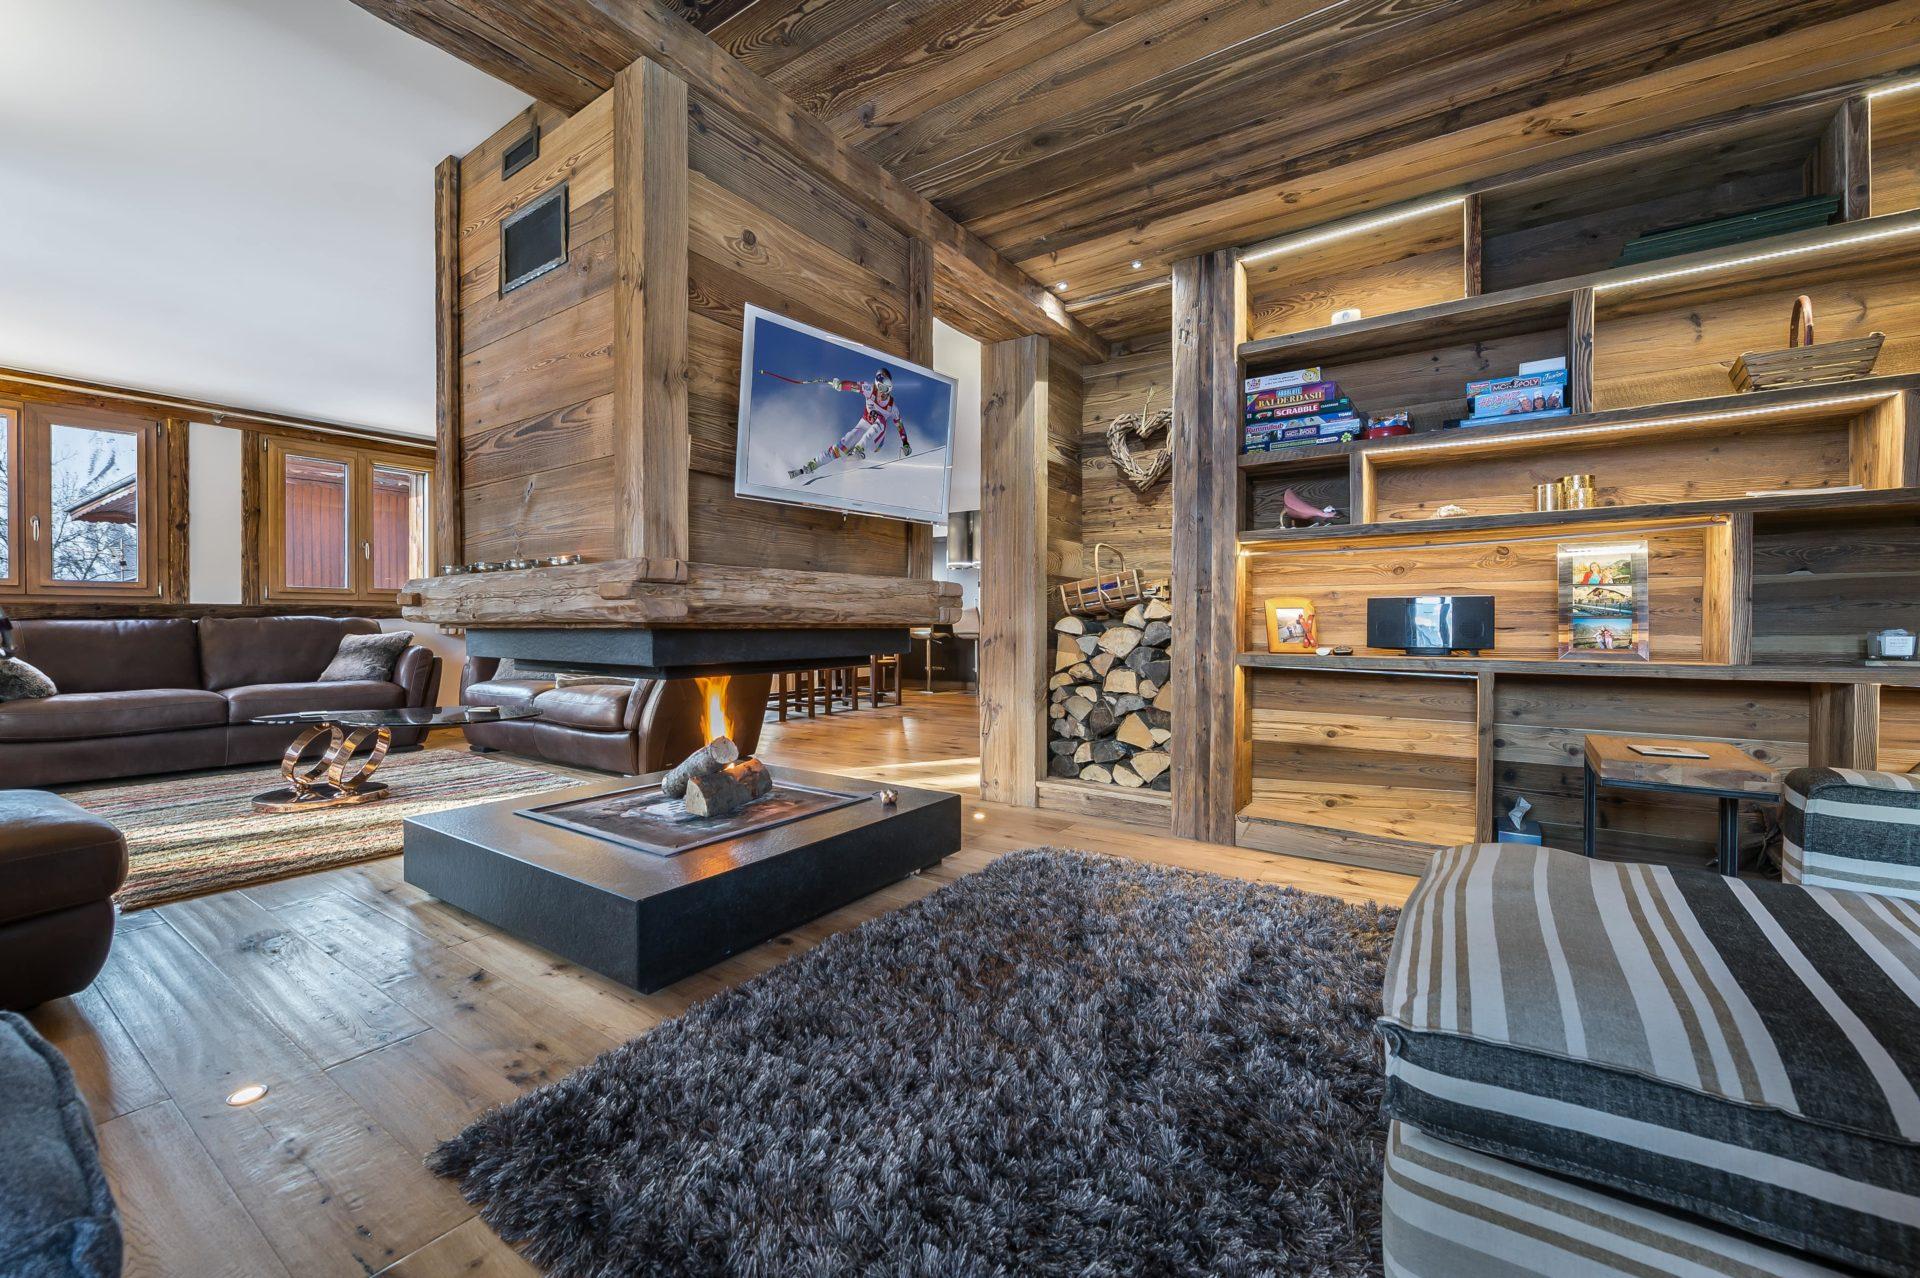 Chalet Chanterelle Salon 1 Villarabout Saint Martin de Belleville, Savoie